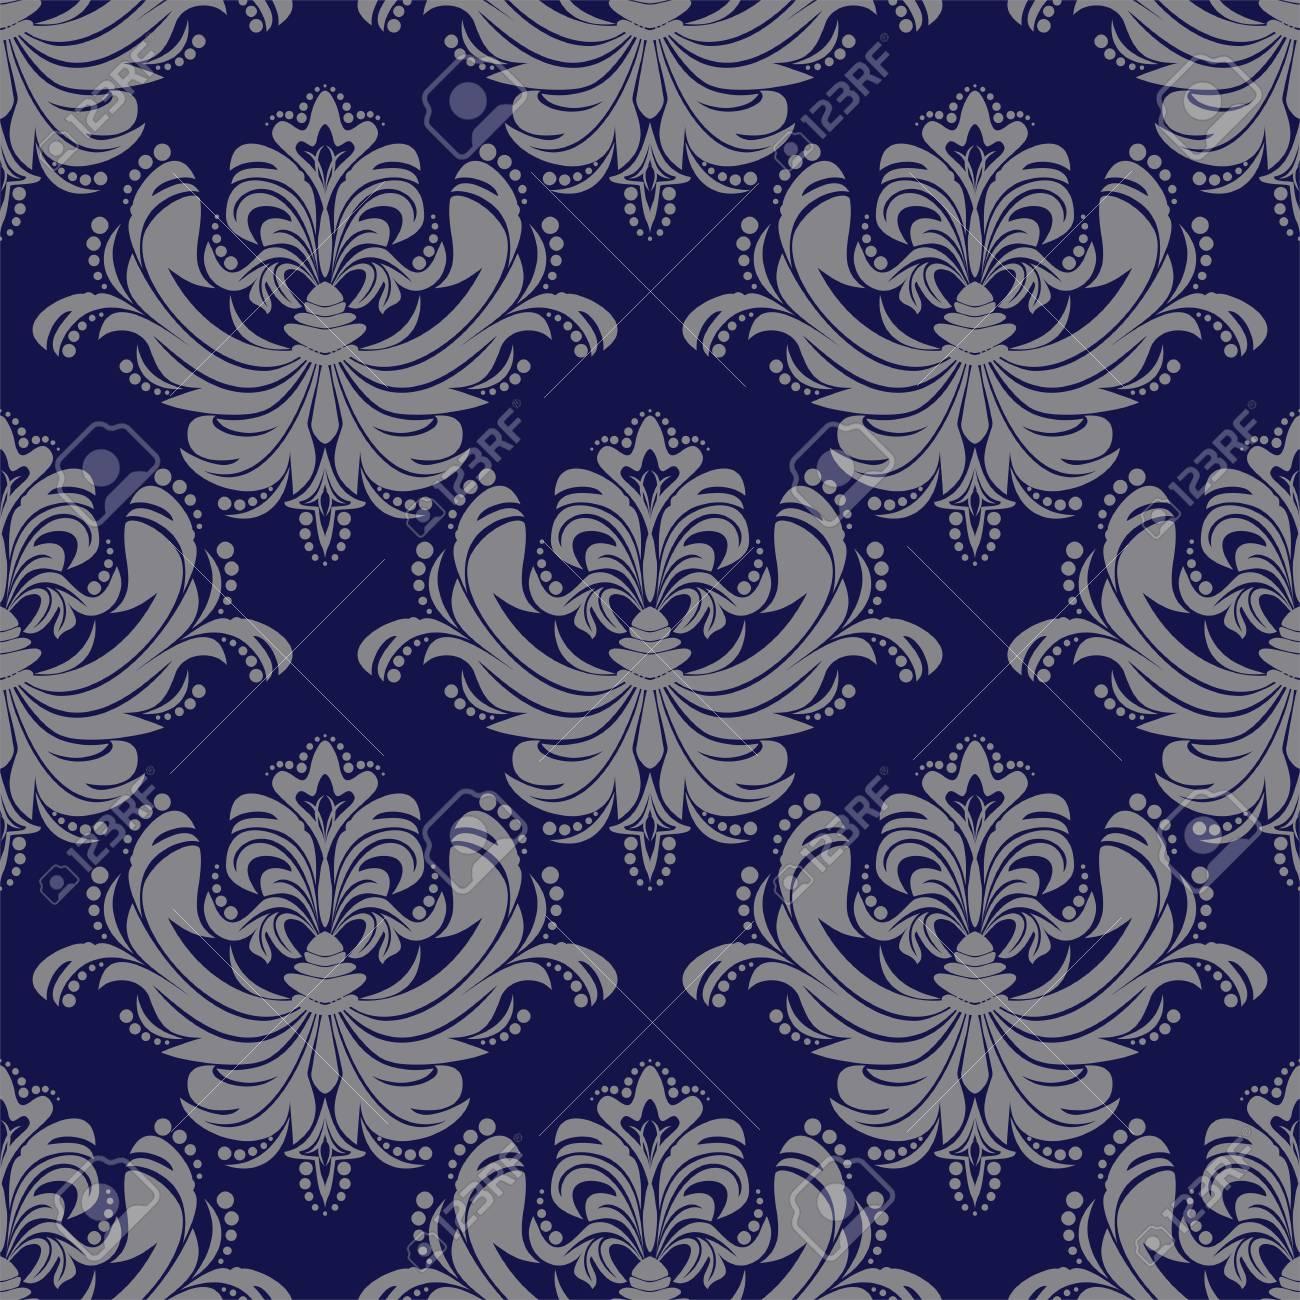 Seamless ornate damask Wallpaper. - 103610979